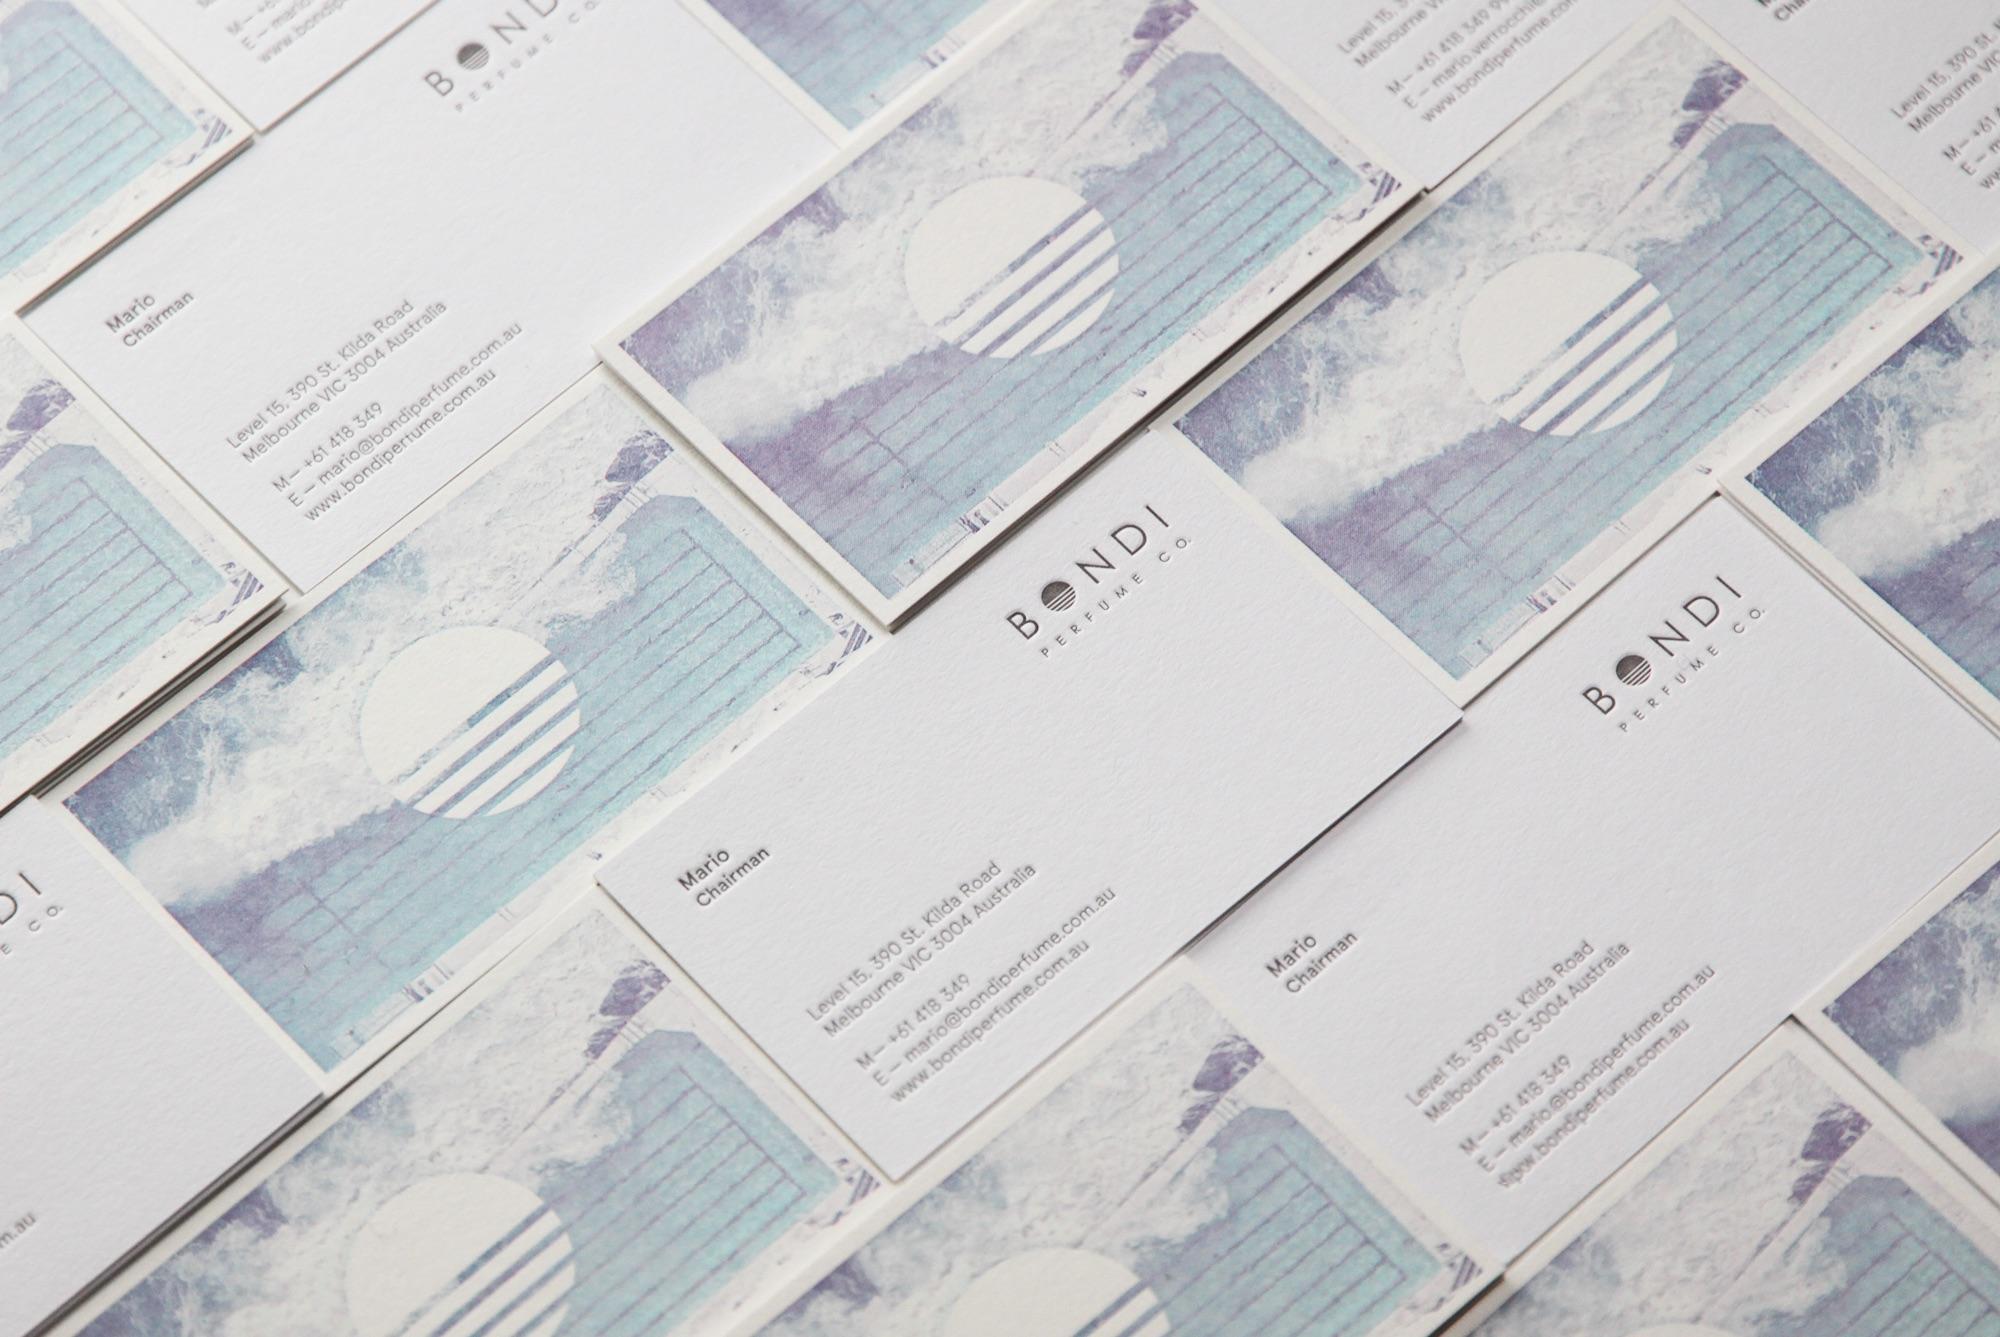 Bondi Perfume Co. Branding